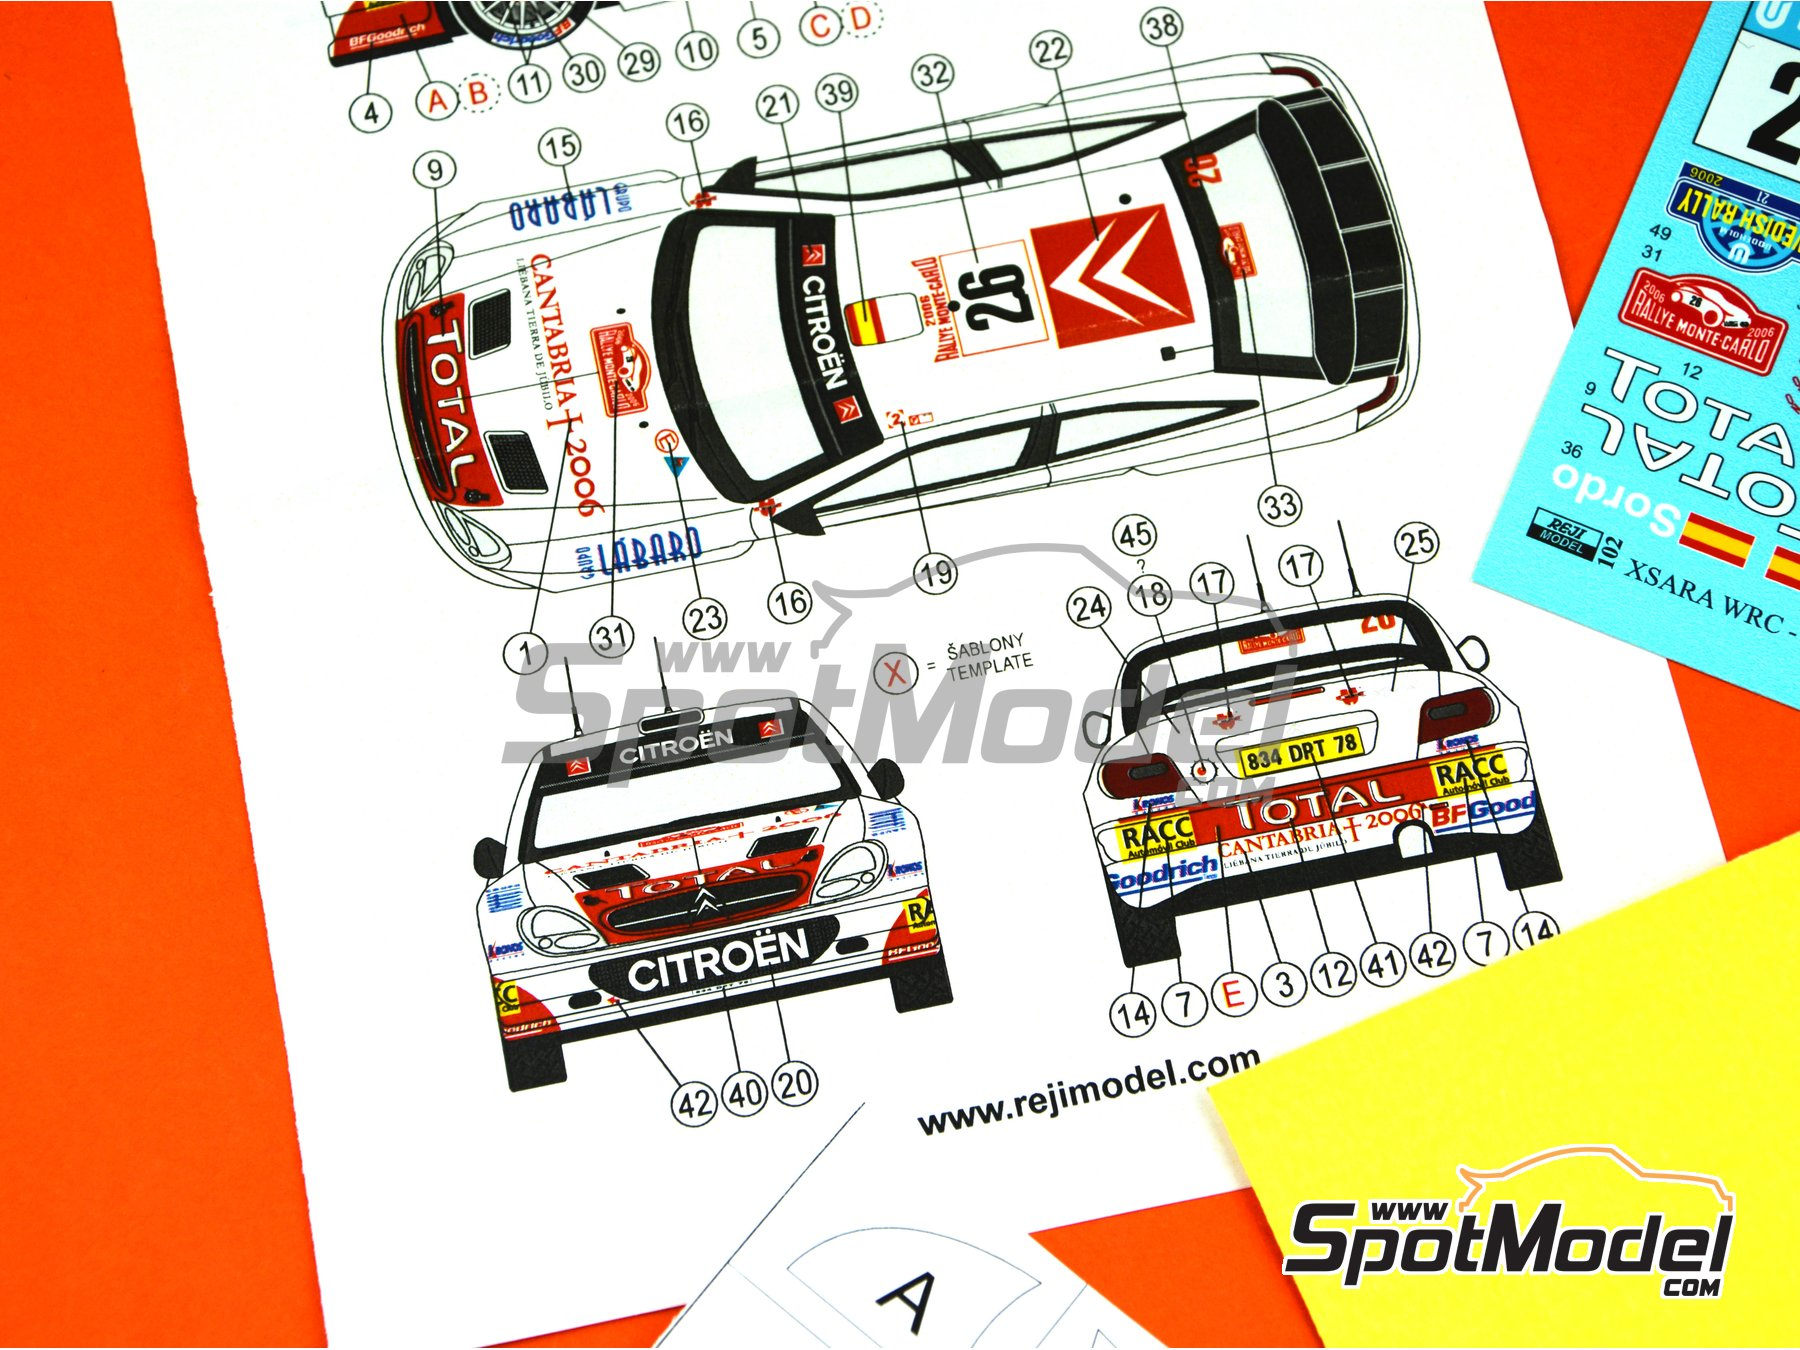 Image 8: Citroen Xsara WRC Kronos - Montecarlo Rally, Svezia Sweden Rally 2006 | Marking / livery in 1/24 scale manufactured by Reji Model (ref.REJI-102)